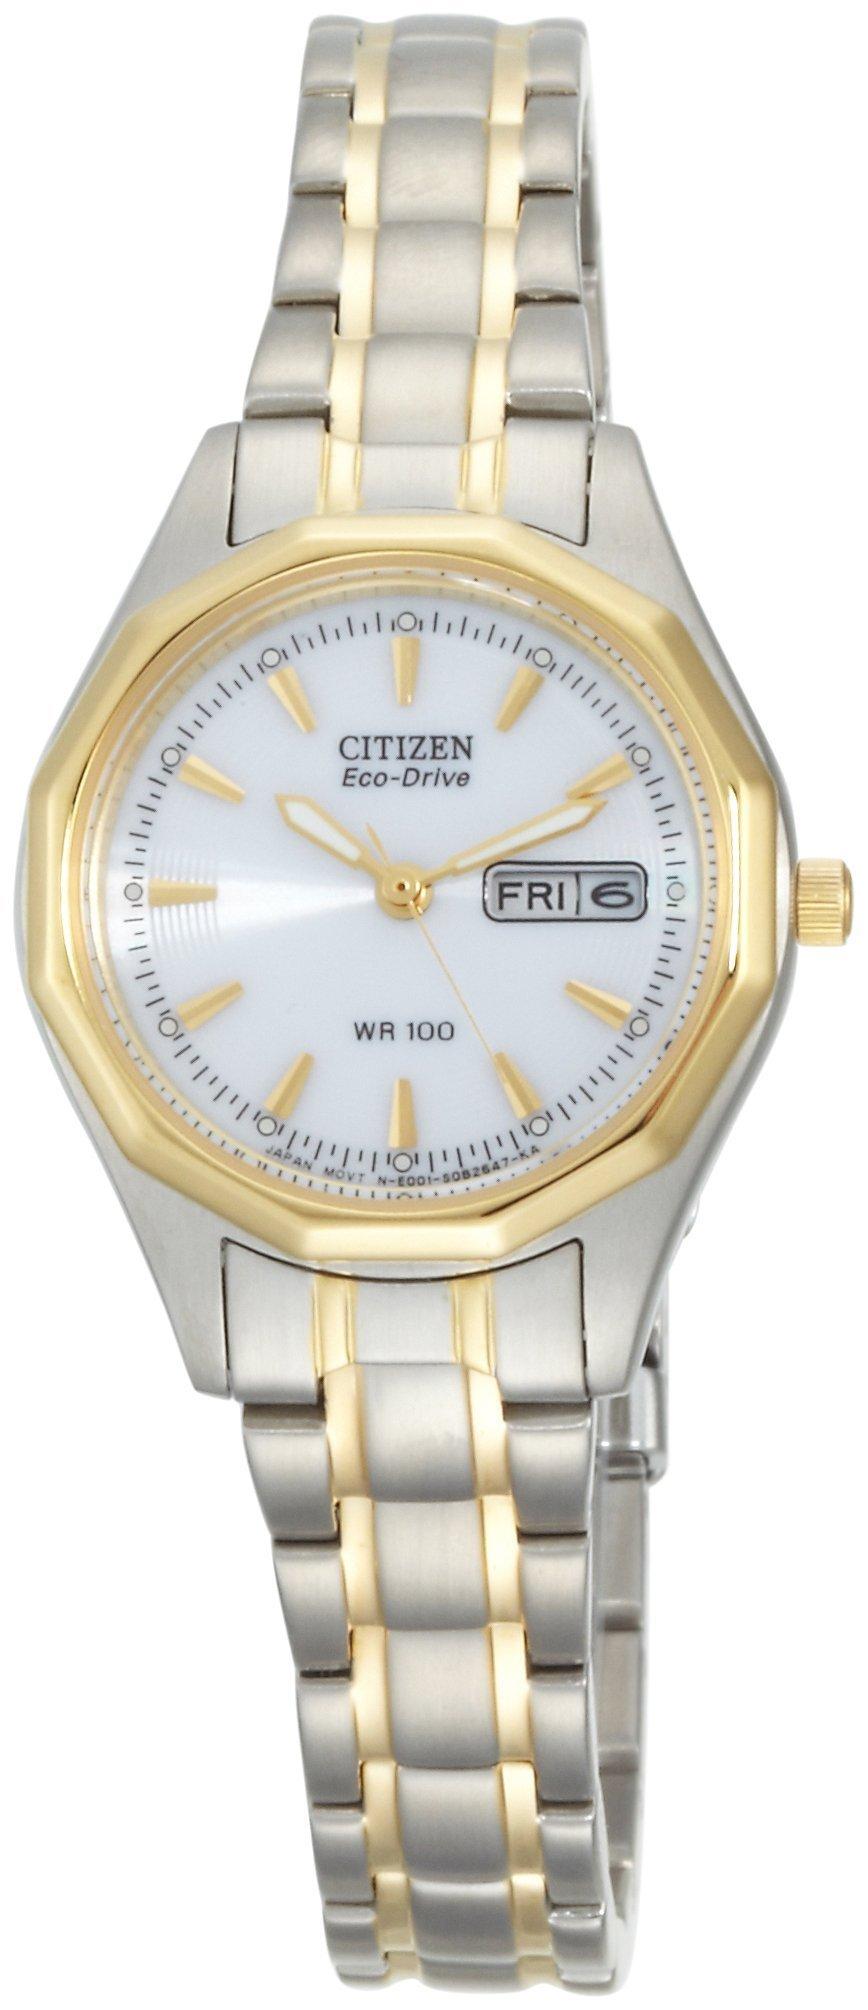 Citizen Women's EW3144-51A Eco-Drive Sport Two-Tone Watch by Citizen (Image #2)